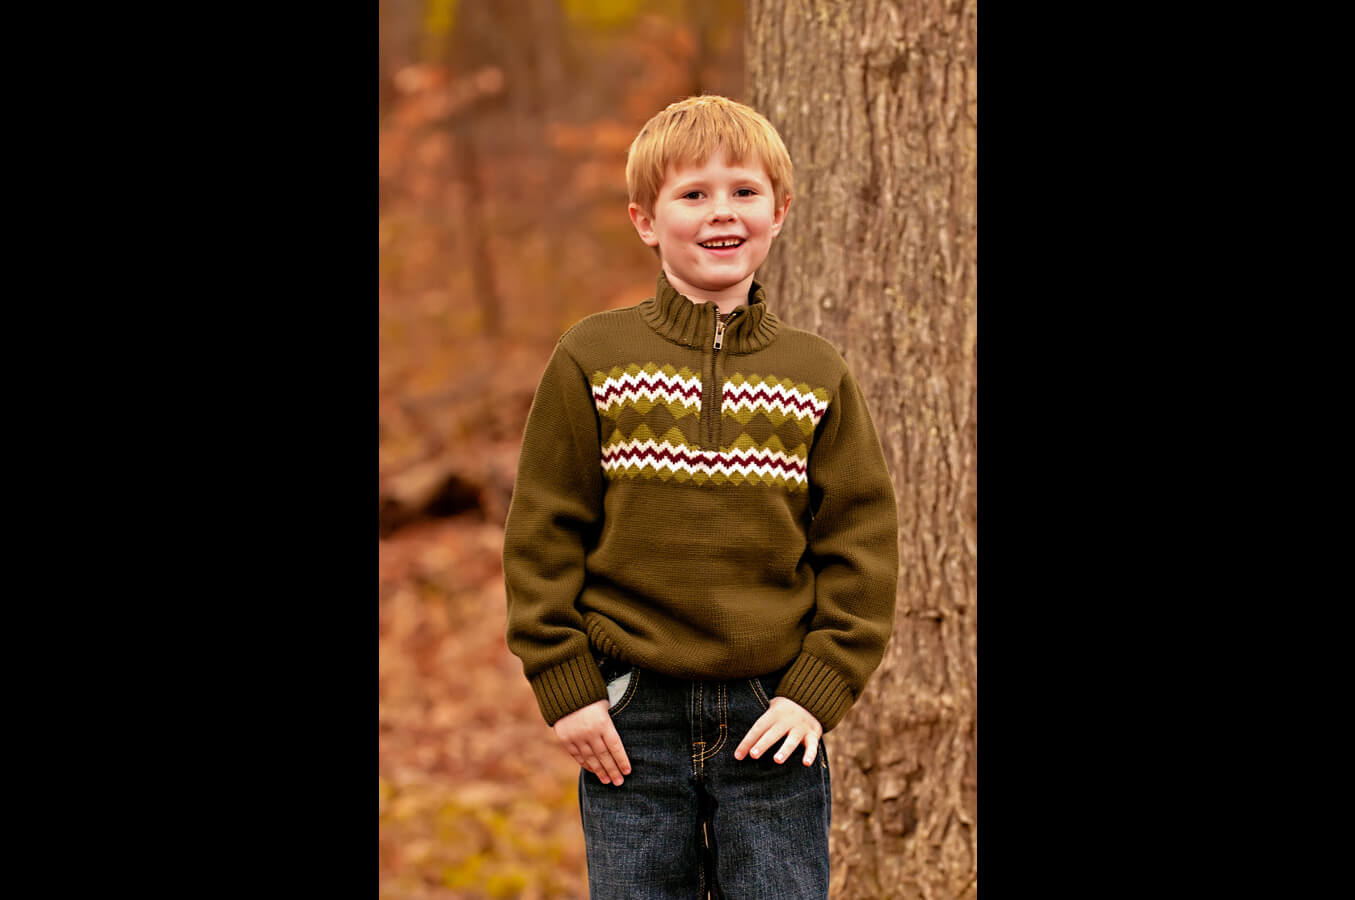 child, portrait, outdoor, autumn, natural light, Northern VA